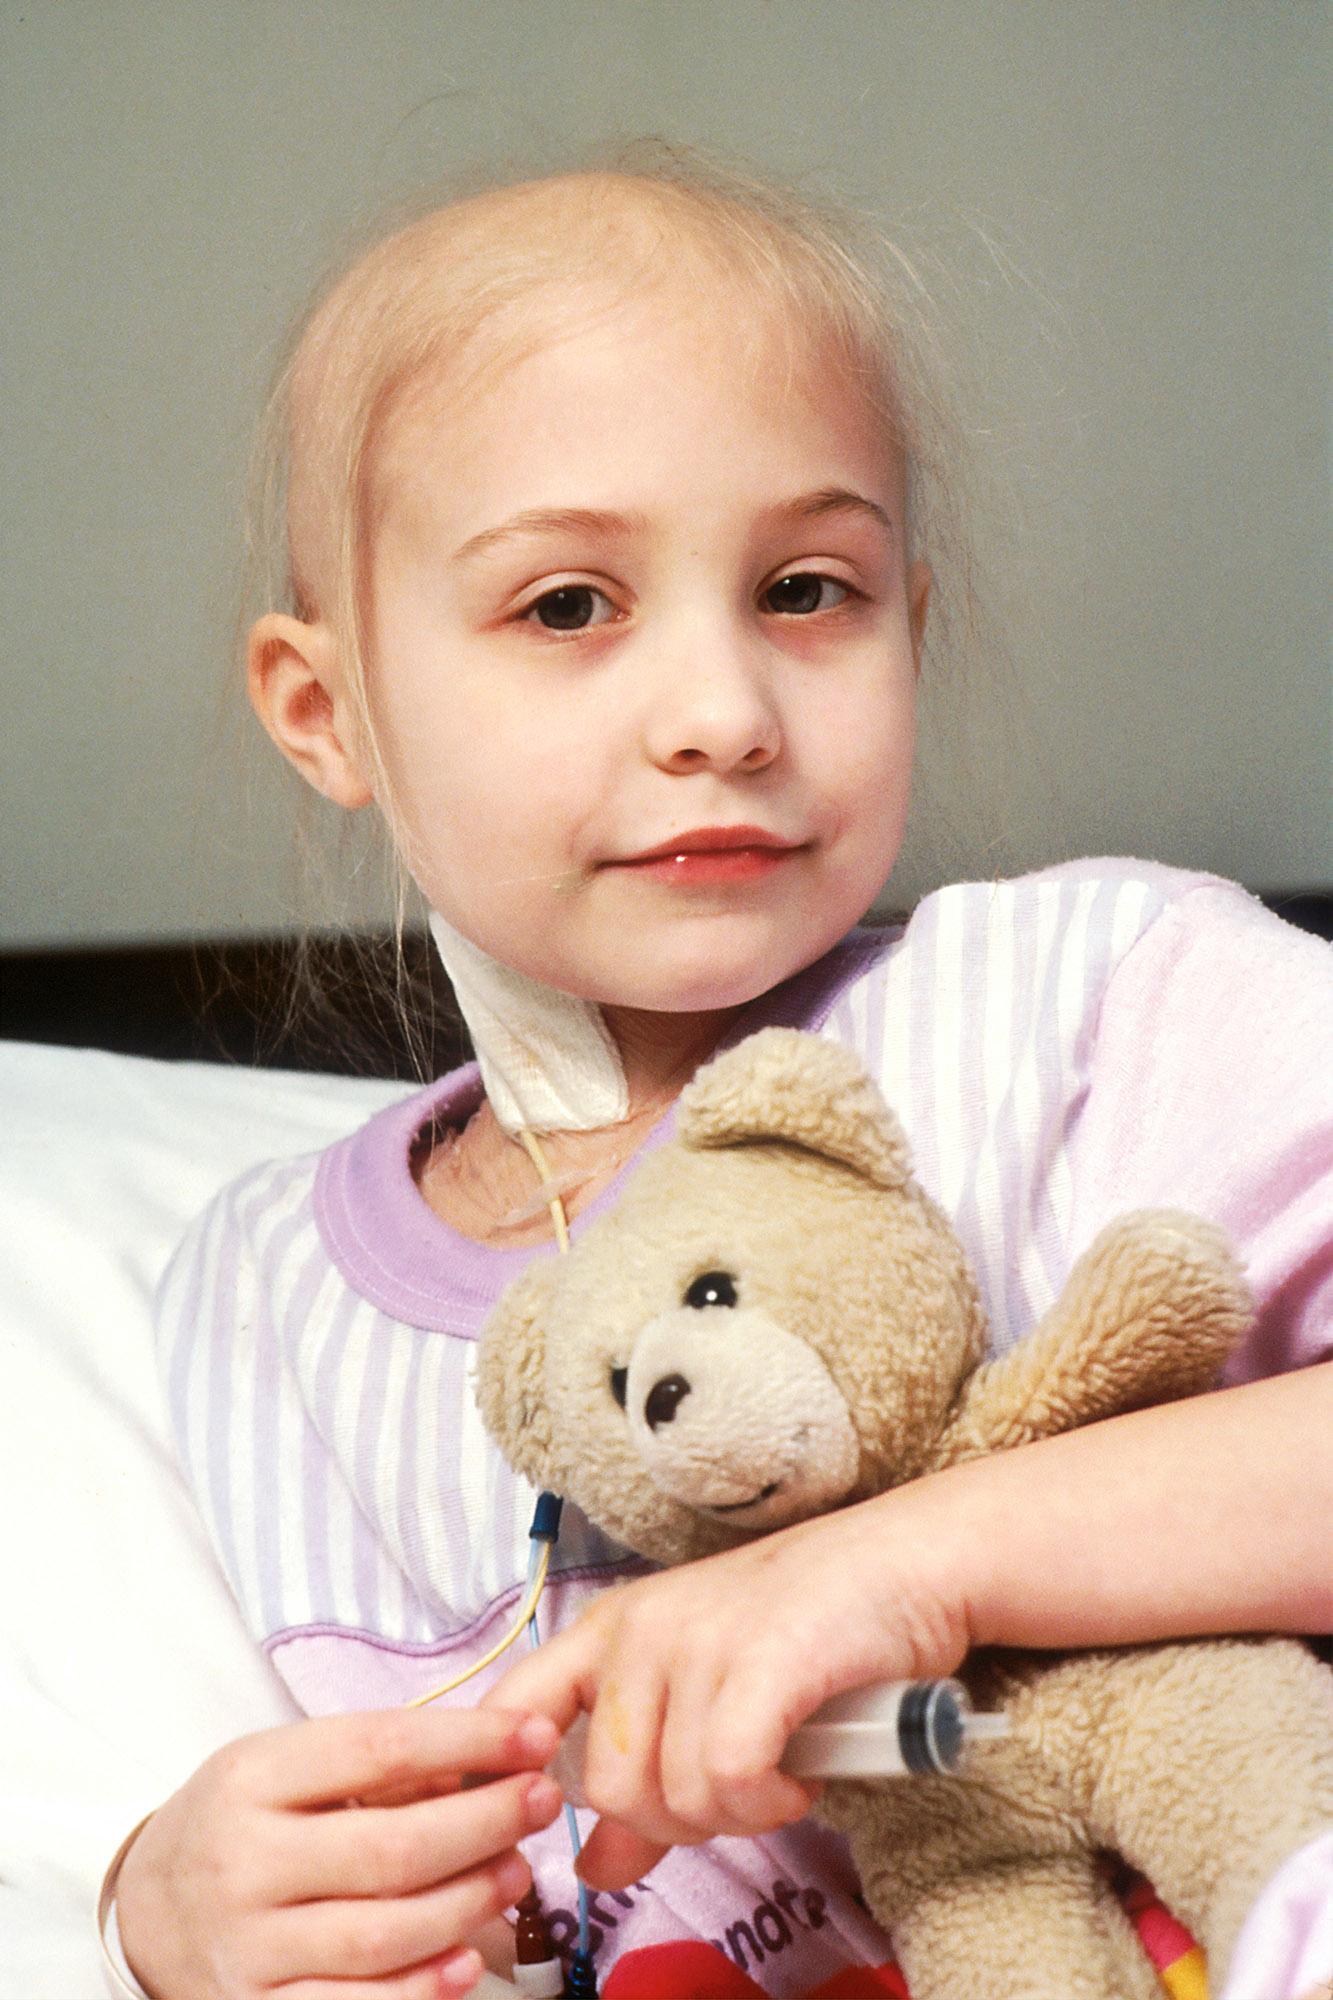 Wereld Kinderkanker Dag